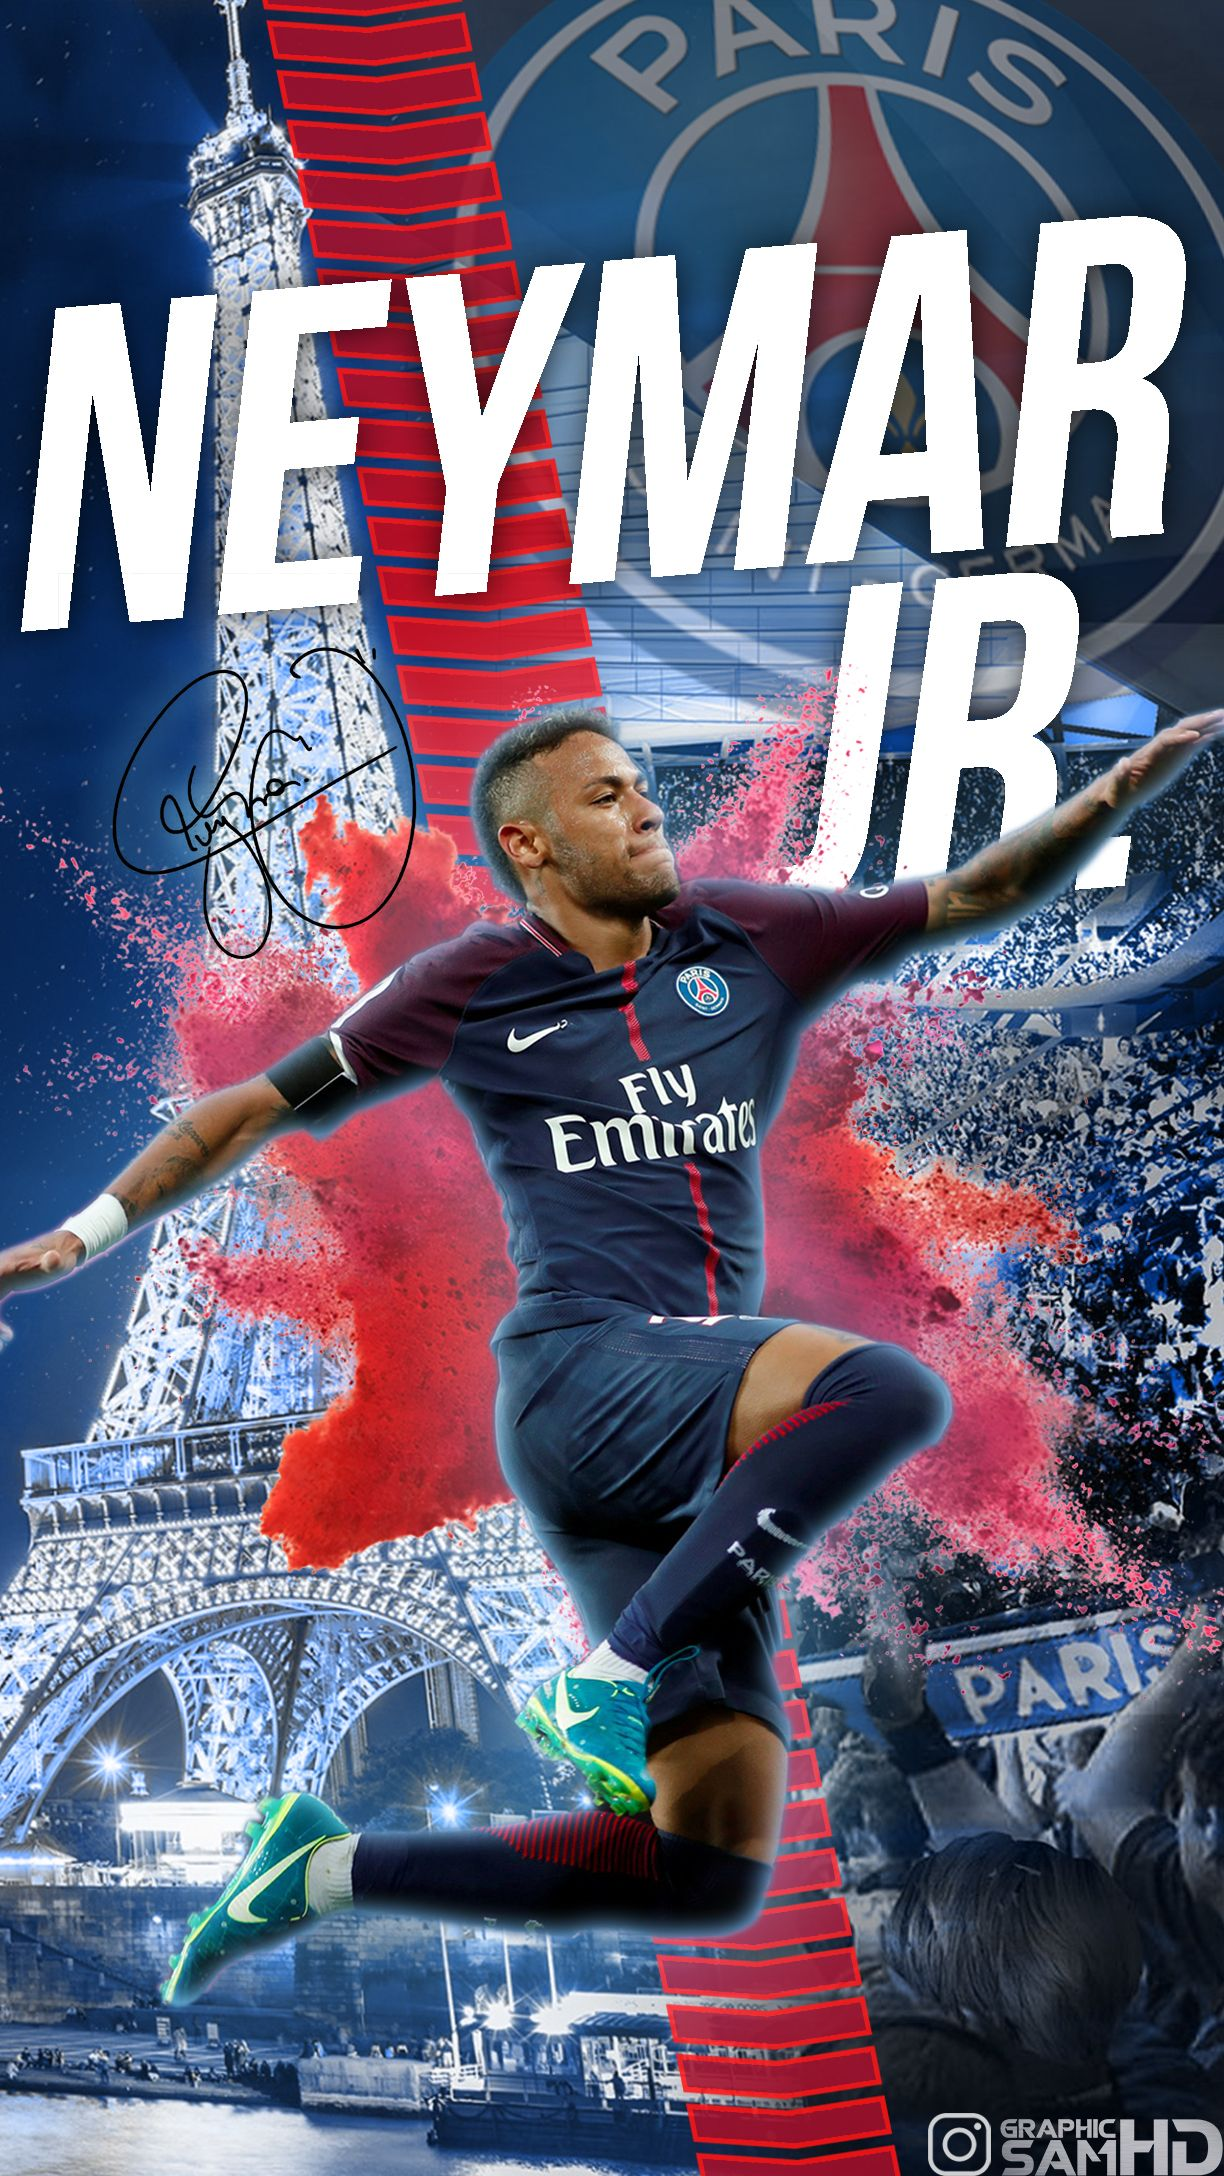 Neymar Jr PSG Phone wallpaper 2017/2018 Neymar jr